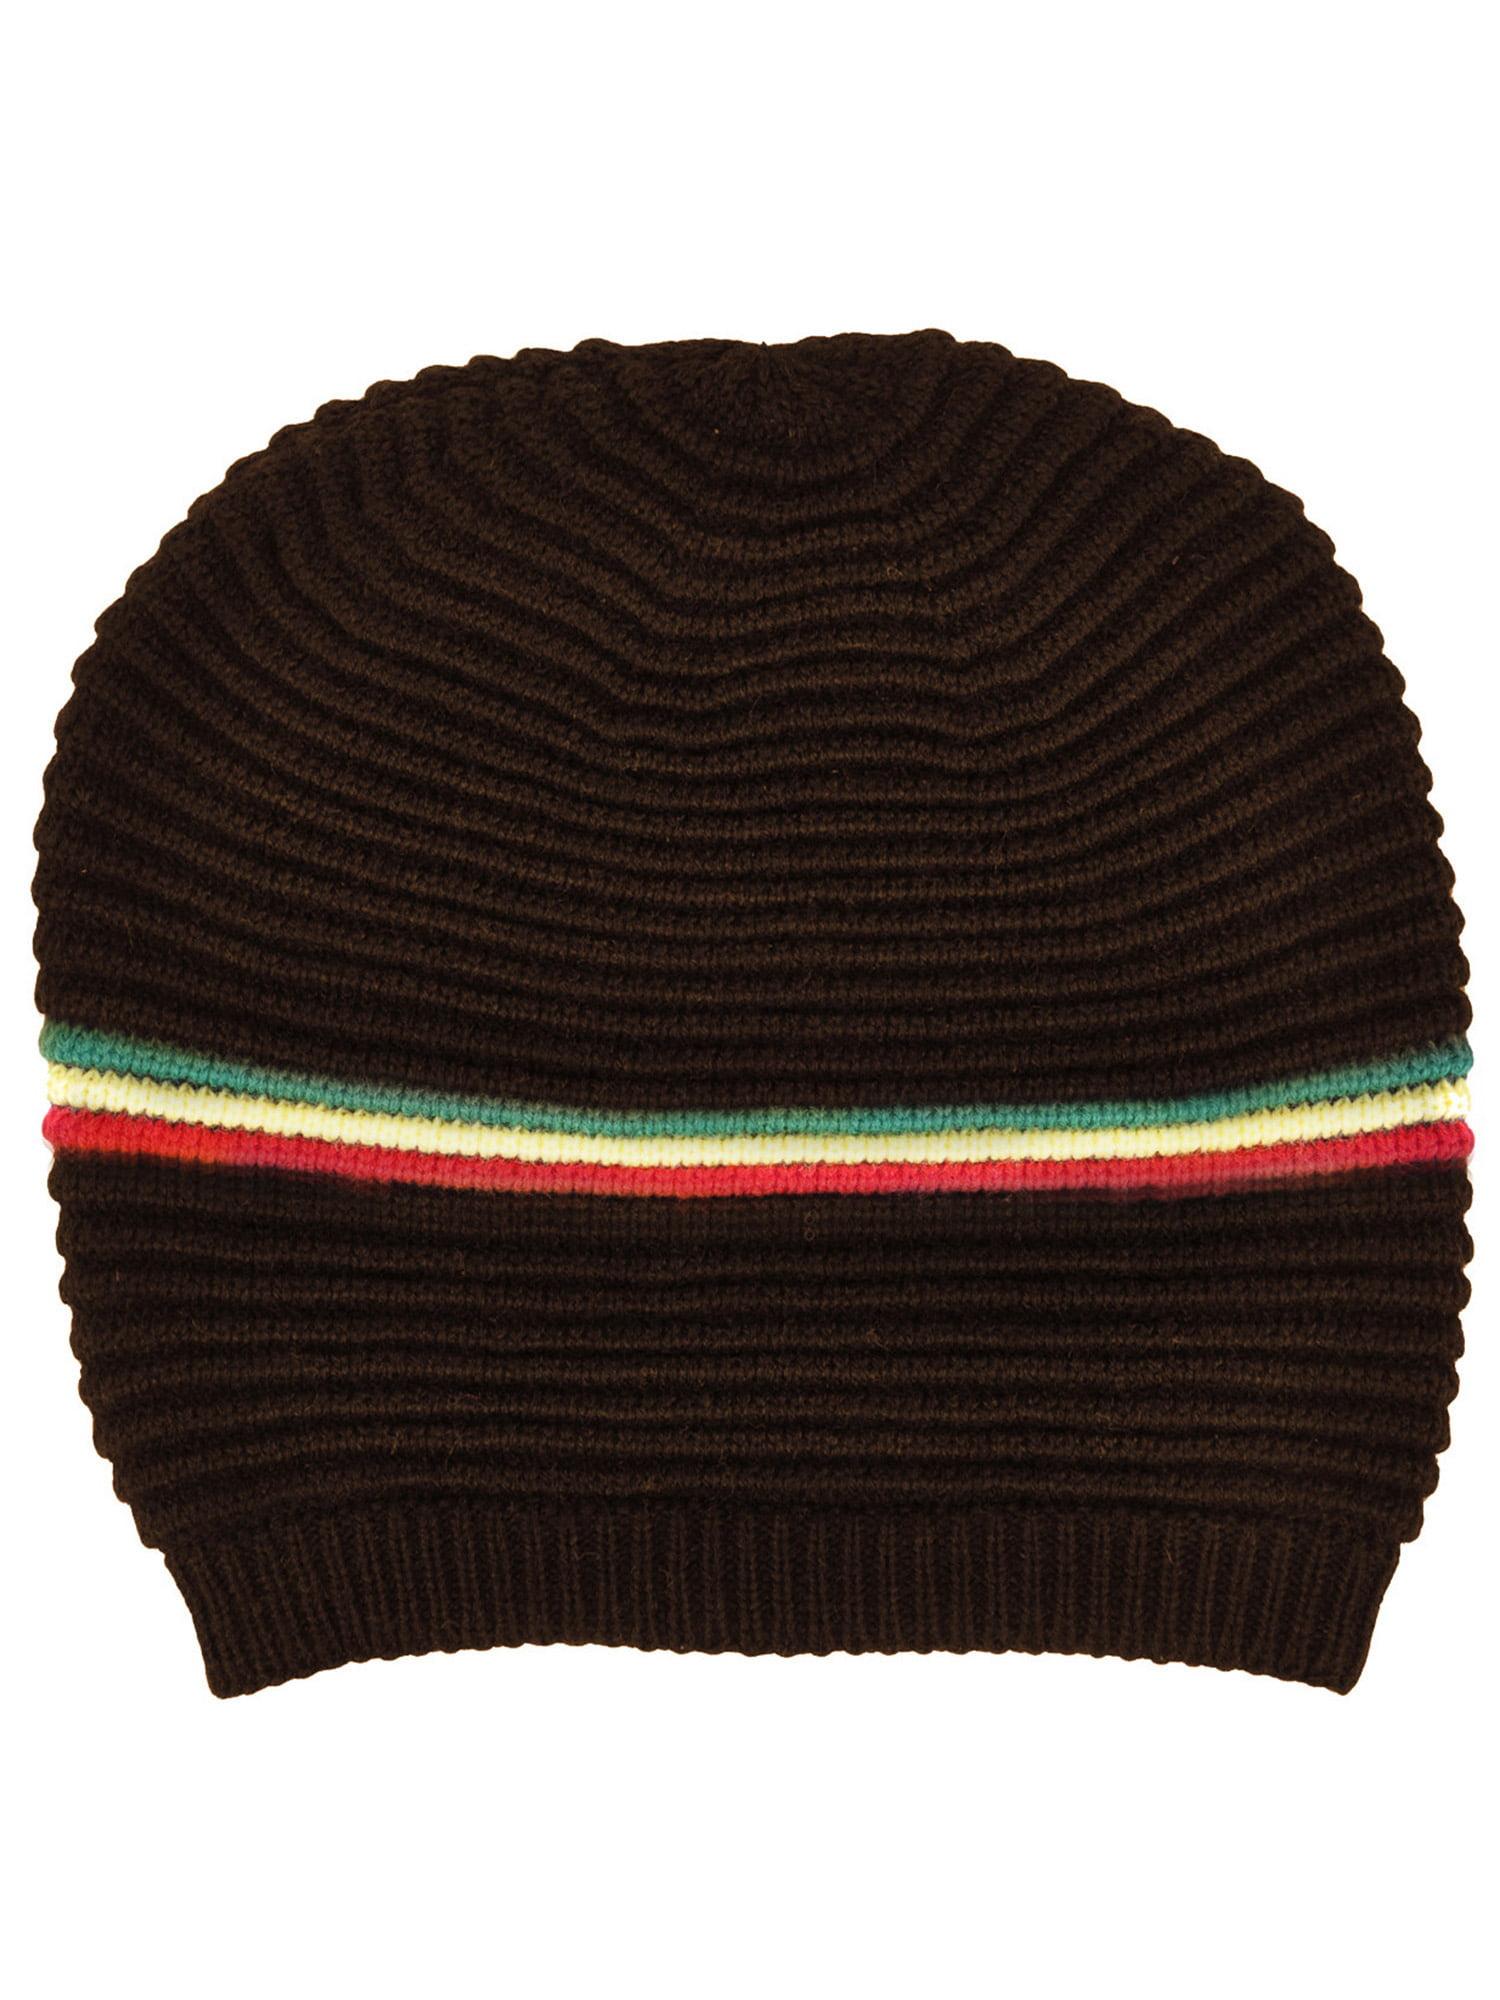 4f10f6cdc Men / Women's Oversized Slouchy Winter Knit Black Beanie Hat, Color Stripes